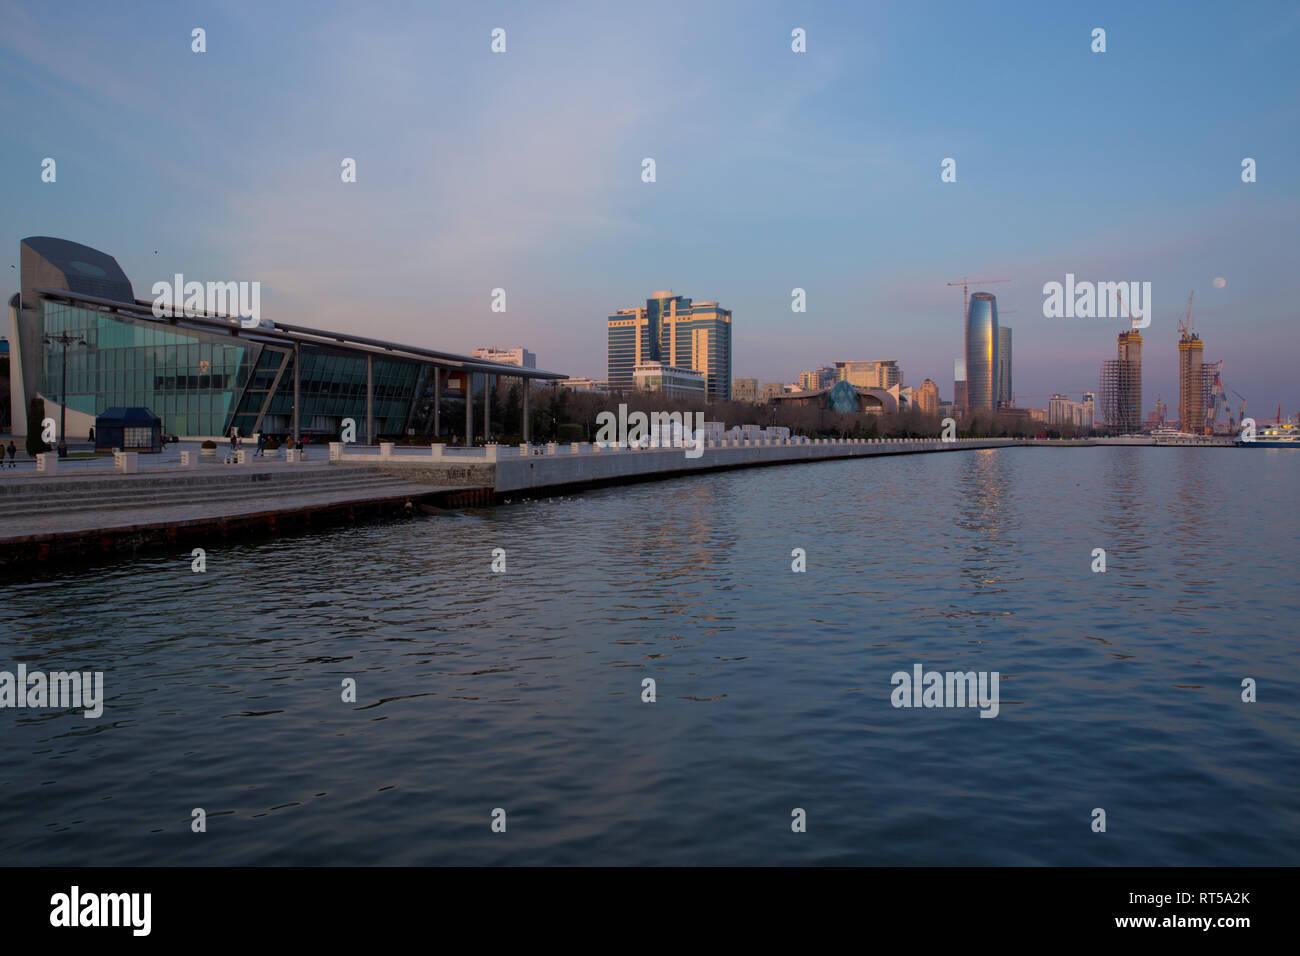 Baky skyline view from Baku boulevard the Caspian Sea embankment . Tall buildings in Baku. Ship cranes . Moon Baku Business Center Stock Photo